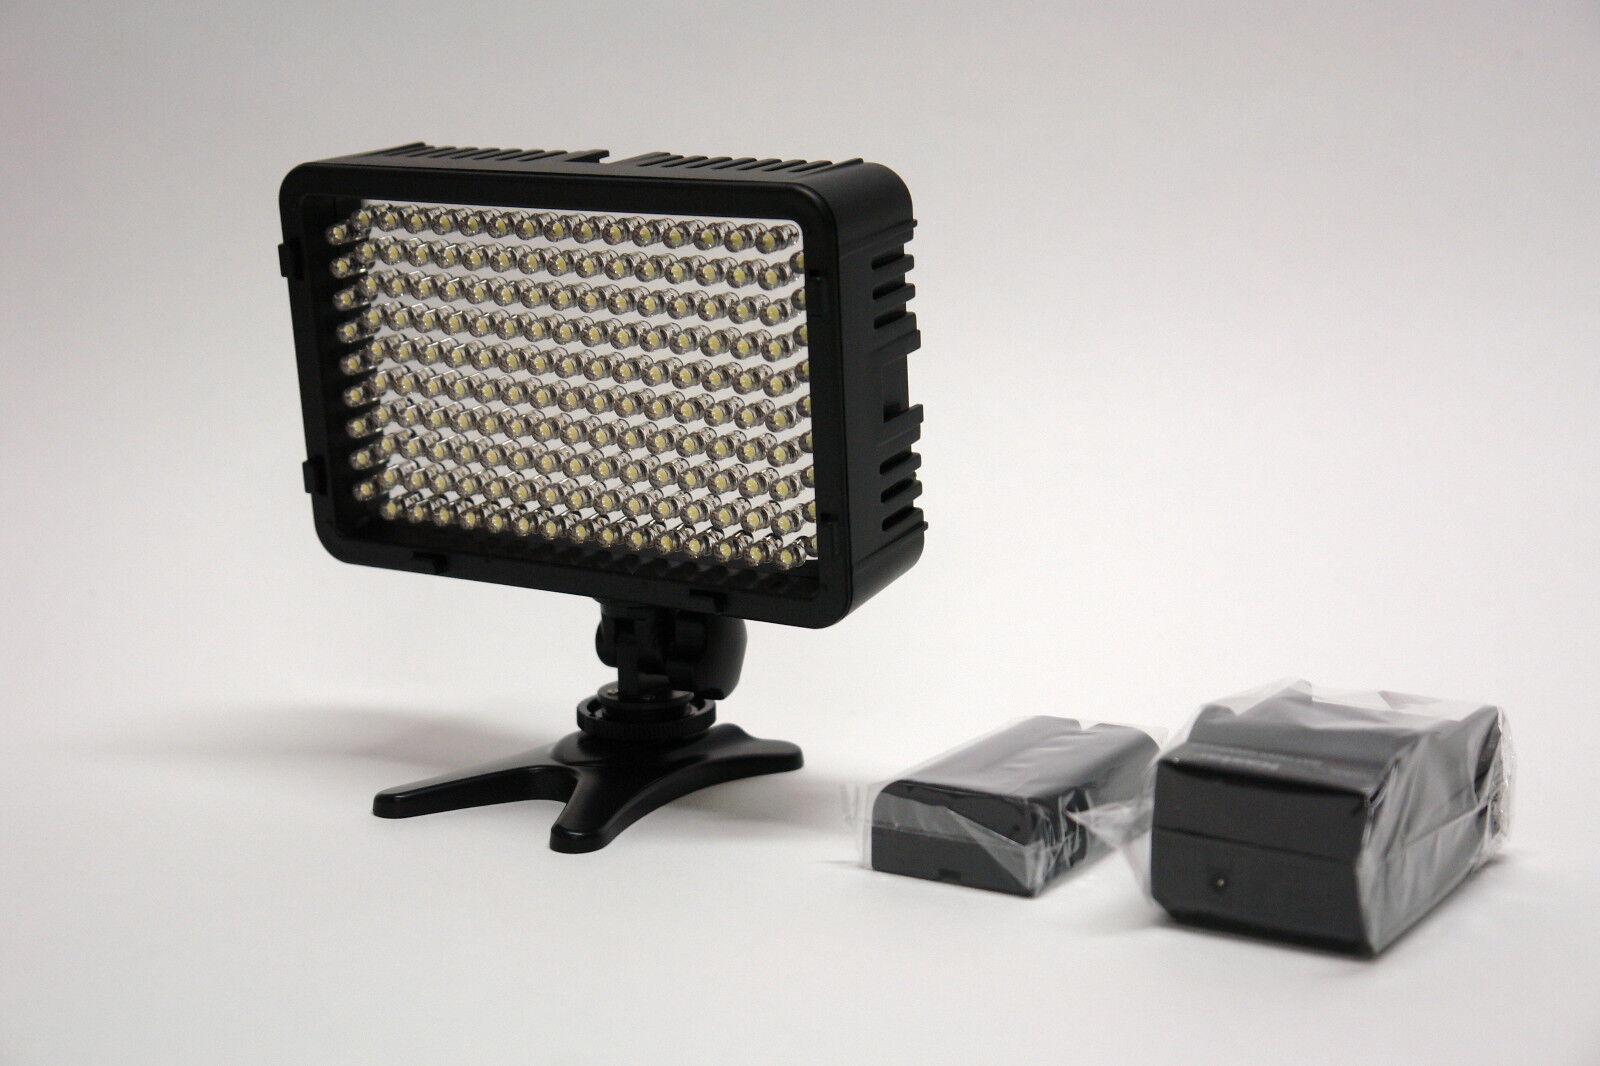 Pro 1 Led Xc Hd Video Light + F970 For Canon Xc15 Xc10 Xc...